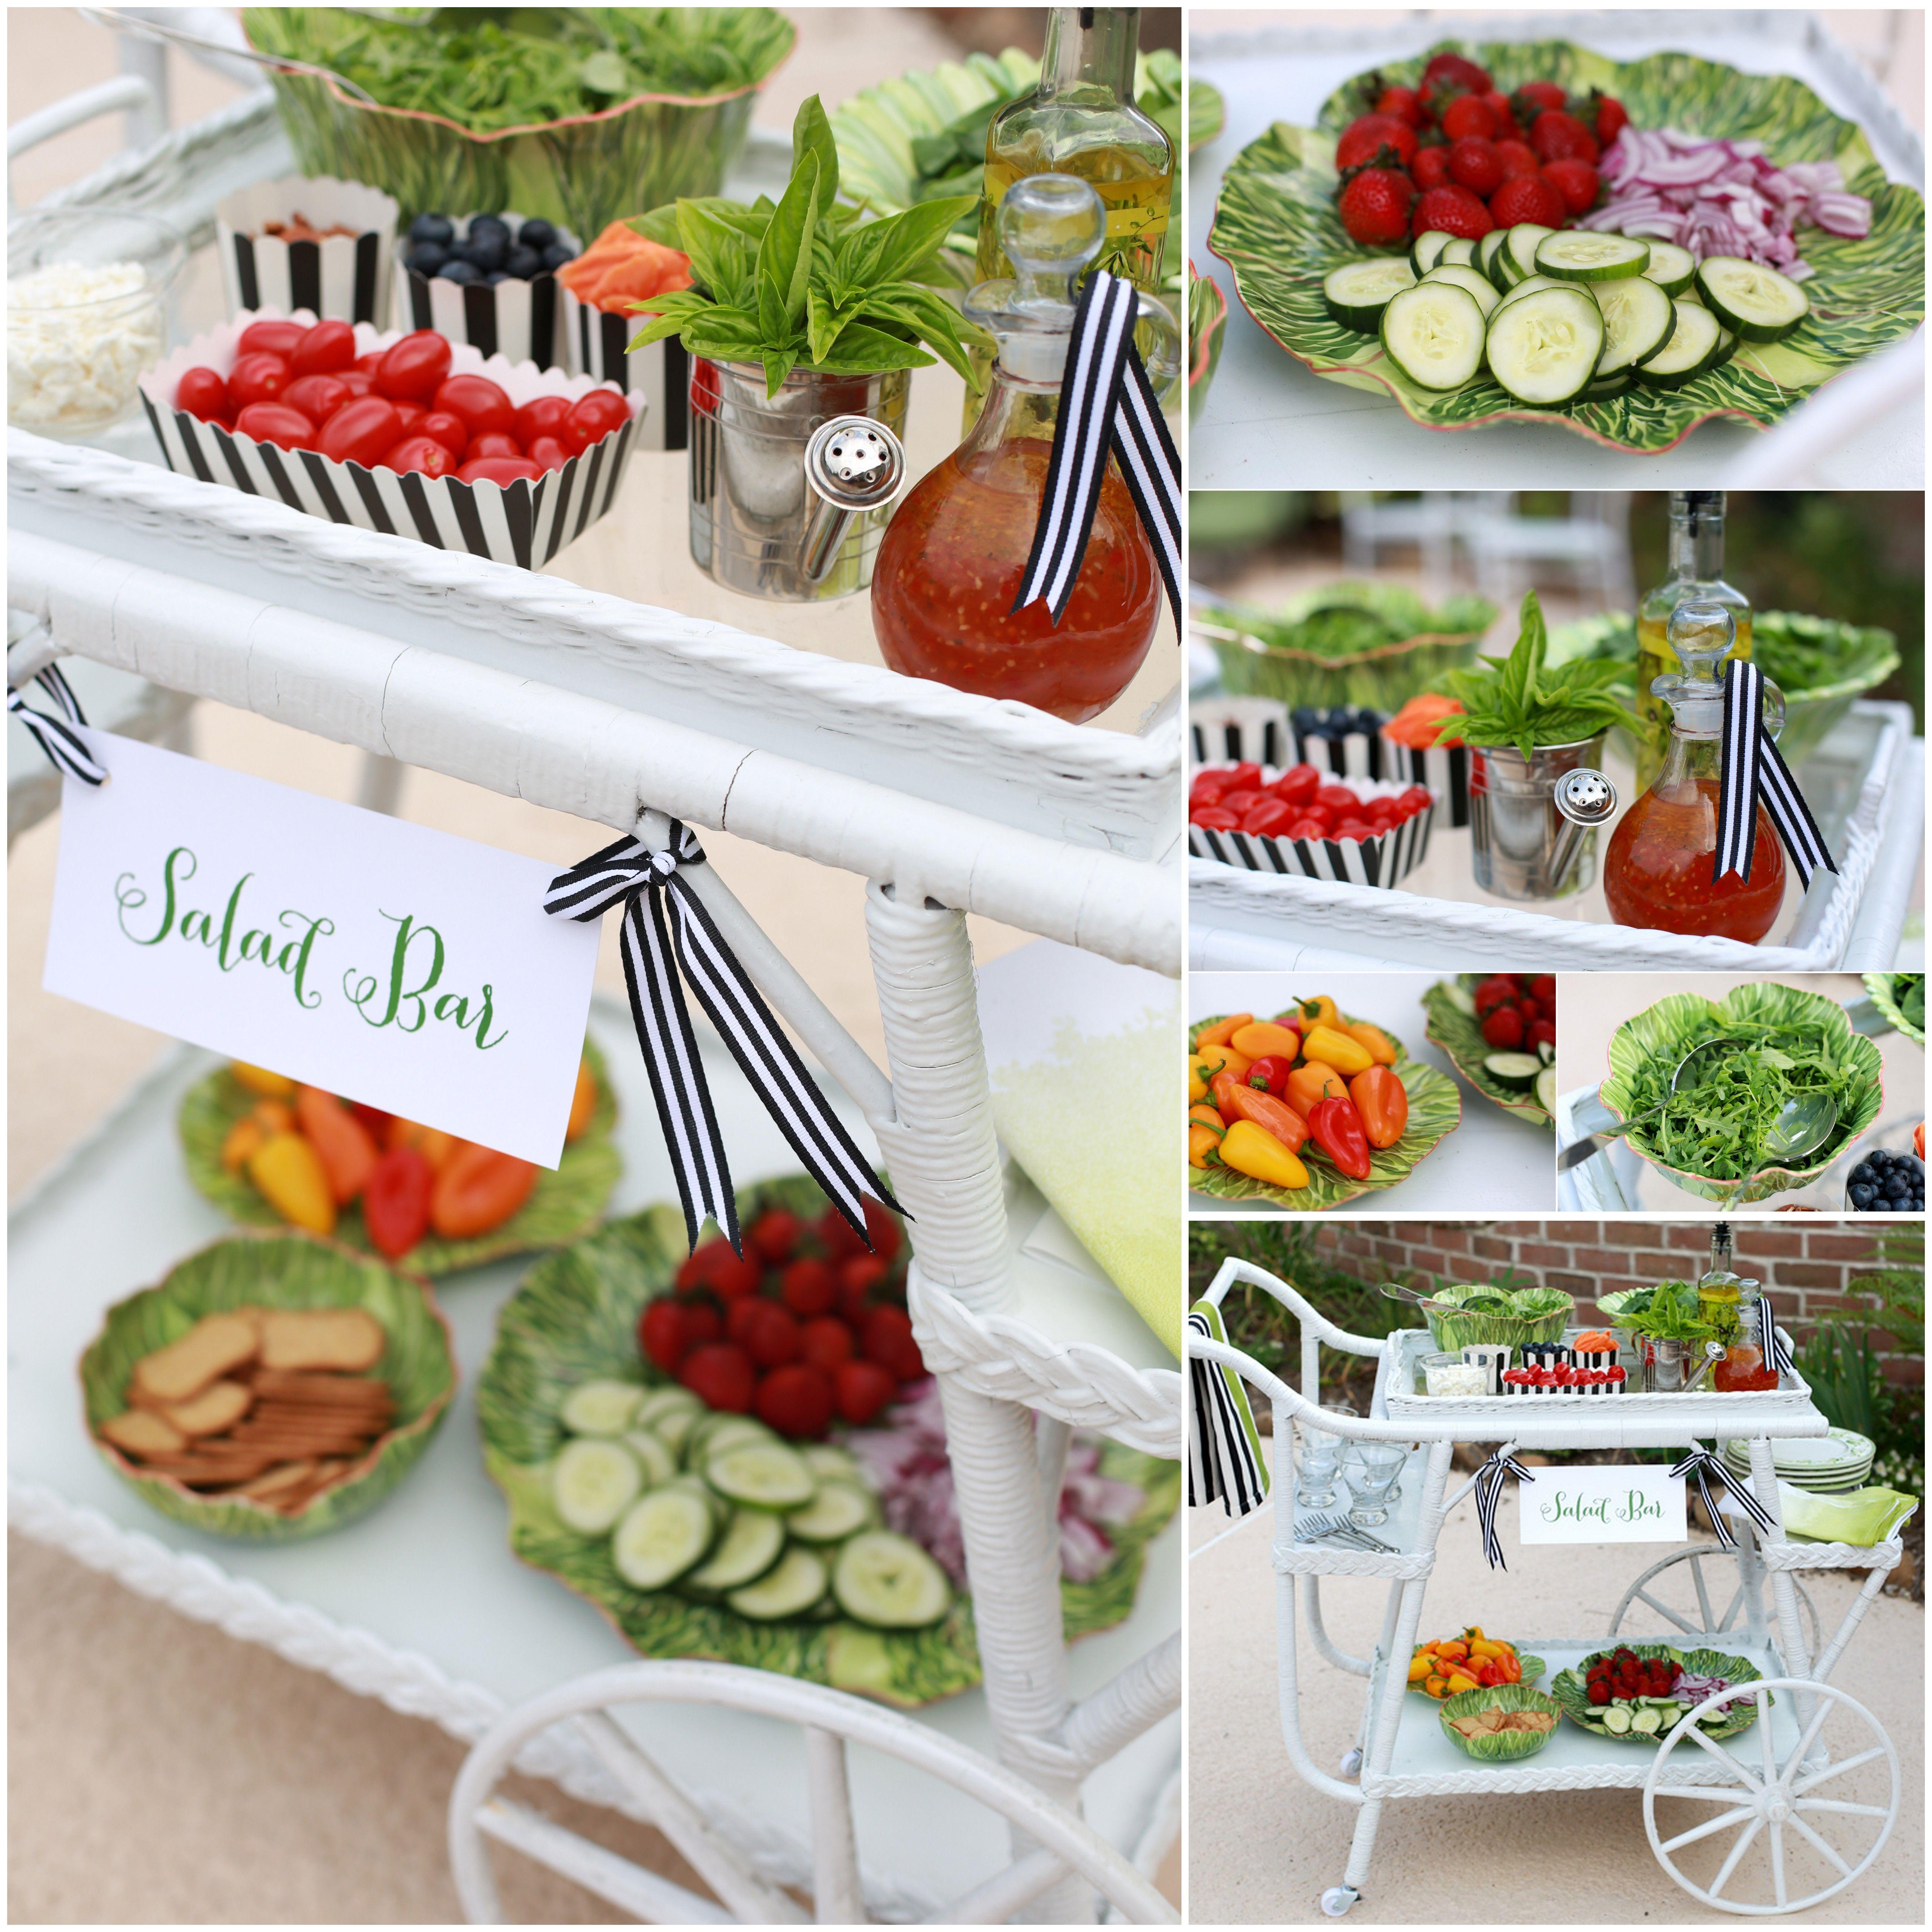 Build a Summer Salad Bar! Idea to SAVE! | Salad bar party ...